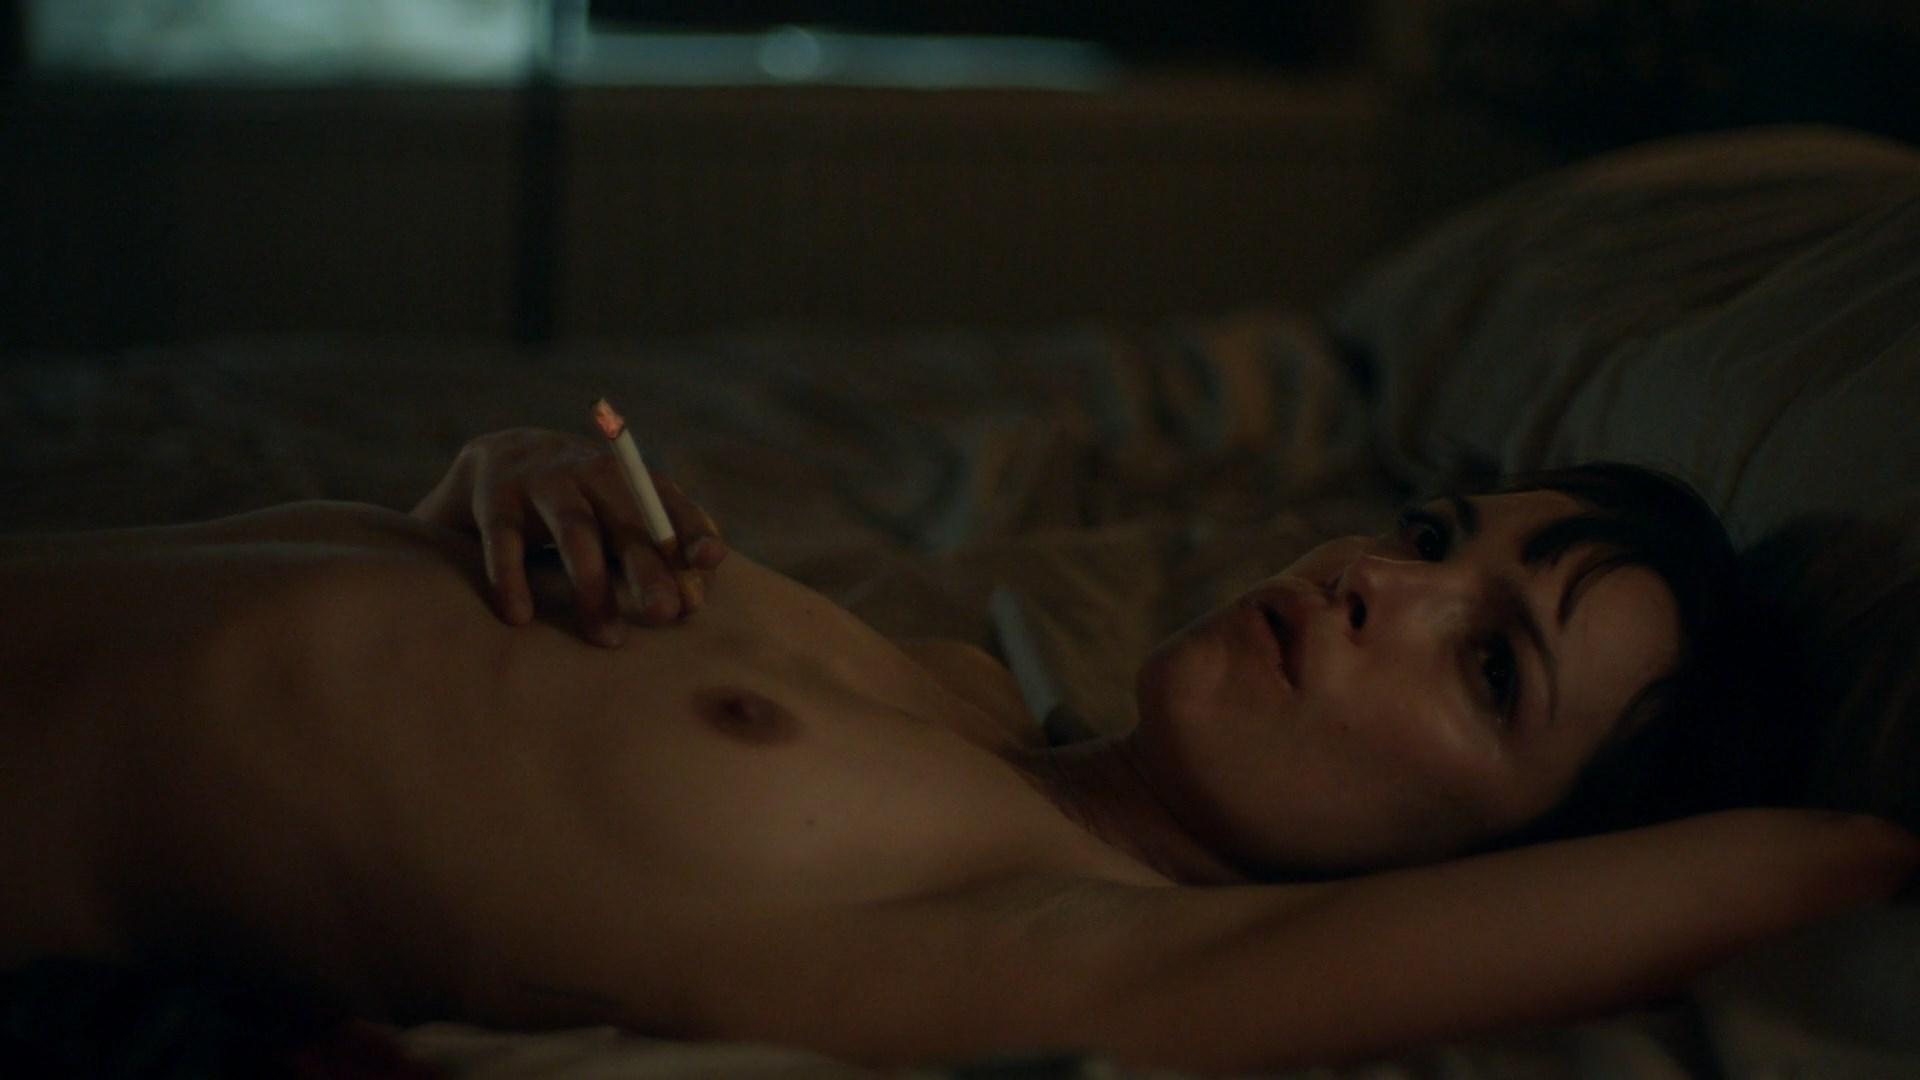 Jody Balfour nude - Rellik s01e05 (2017)